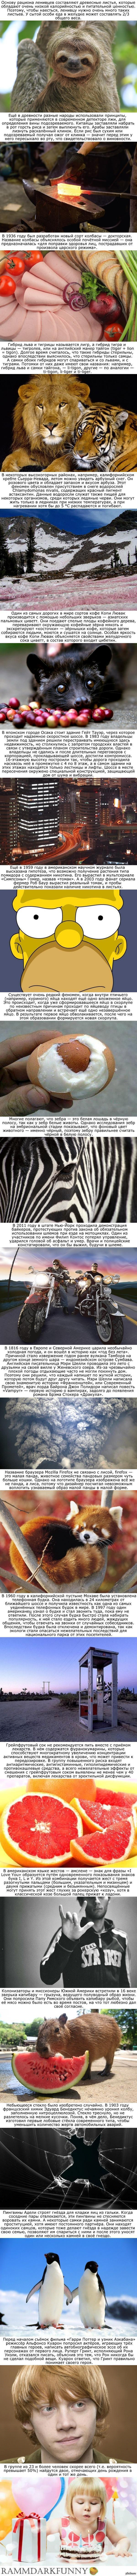 http://s.pikabu.ru/post_img/2013/08/02/8/1375447650_1965052233.JPG